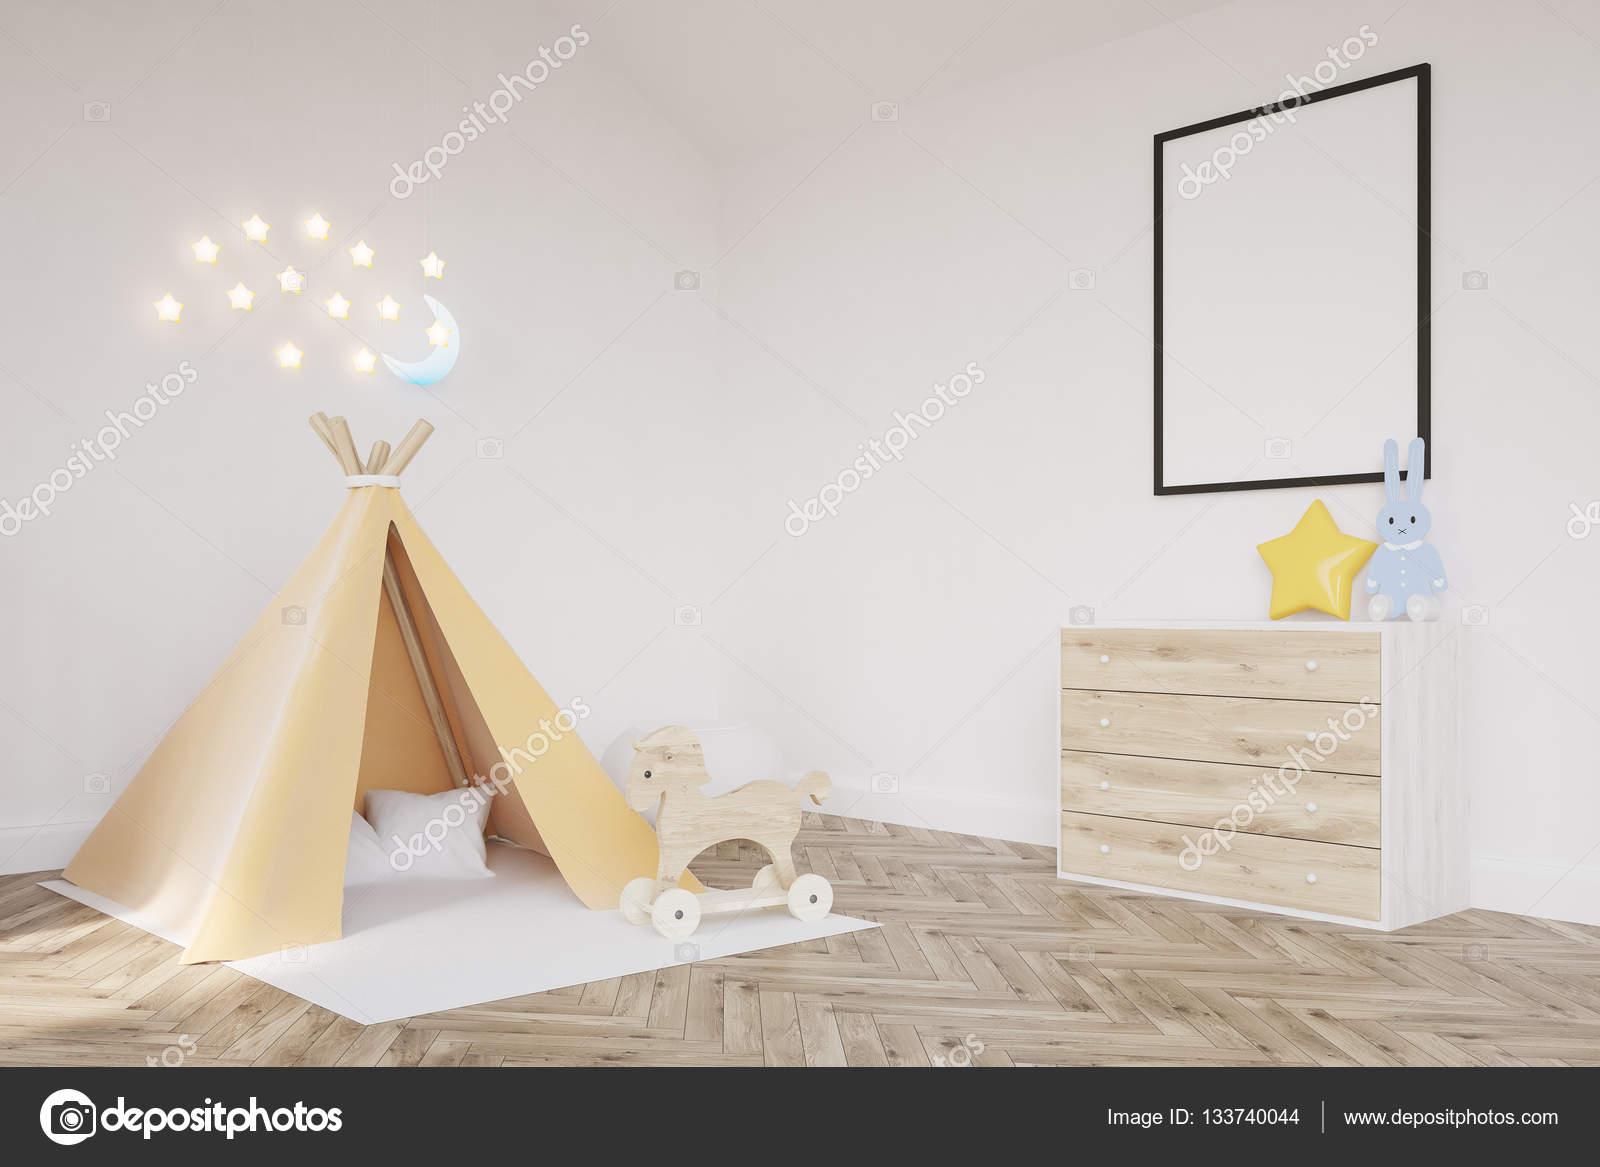 Kinderzimmer Zelt   Kinderzimmer Mit Einem Zelt Stockfoto C Denisismagilov 133740044